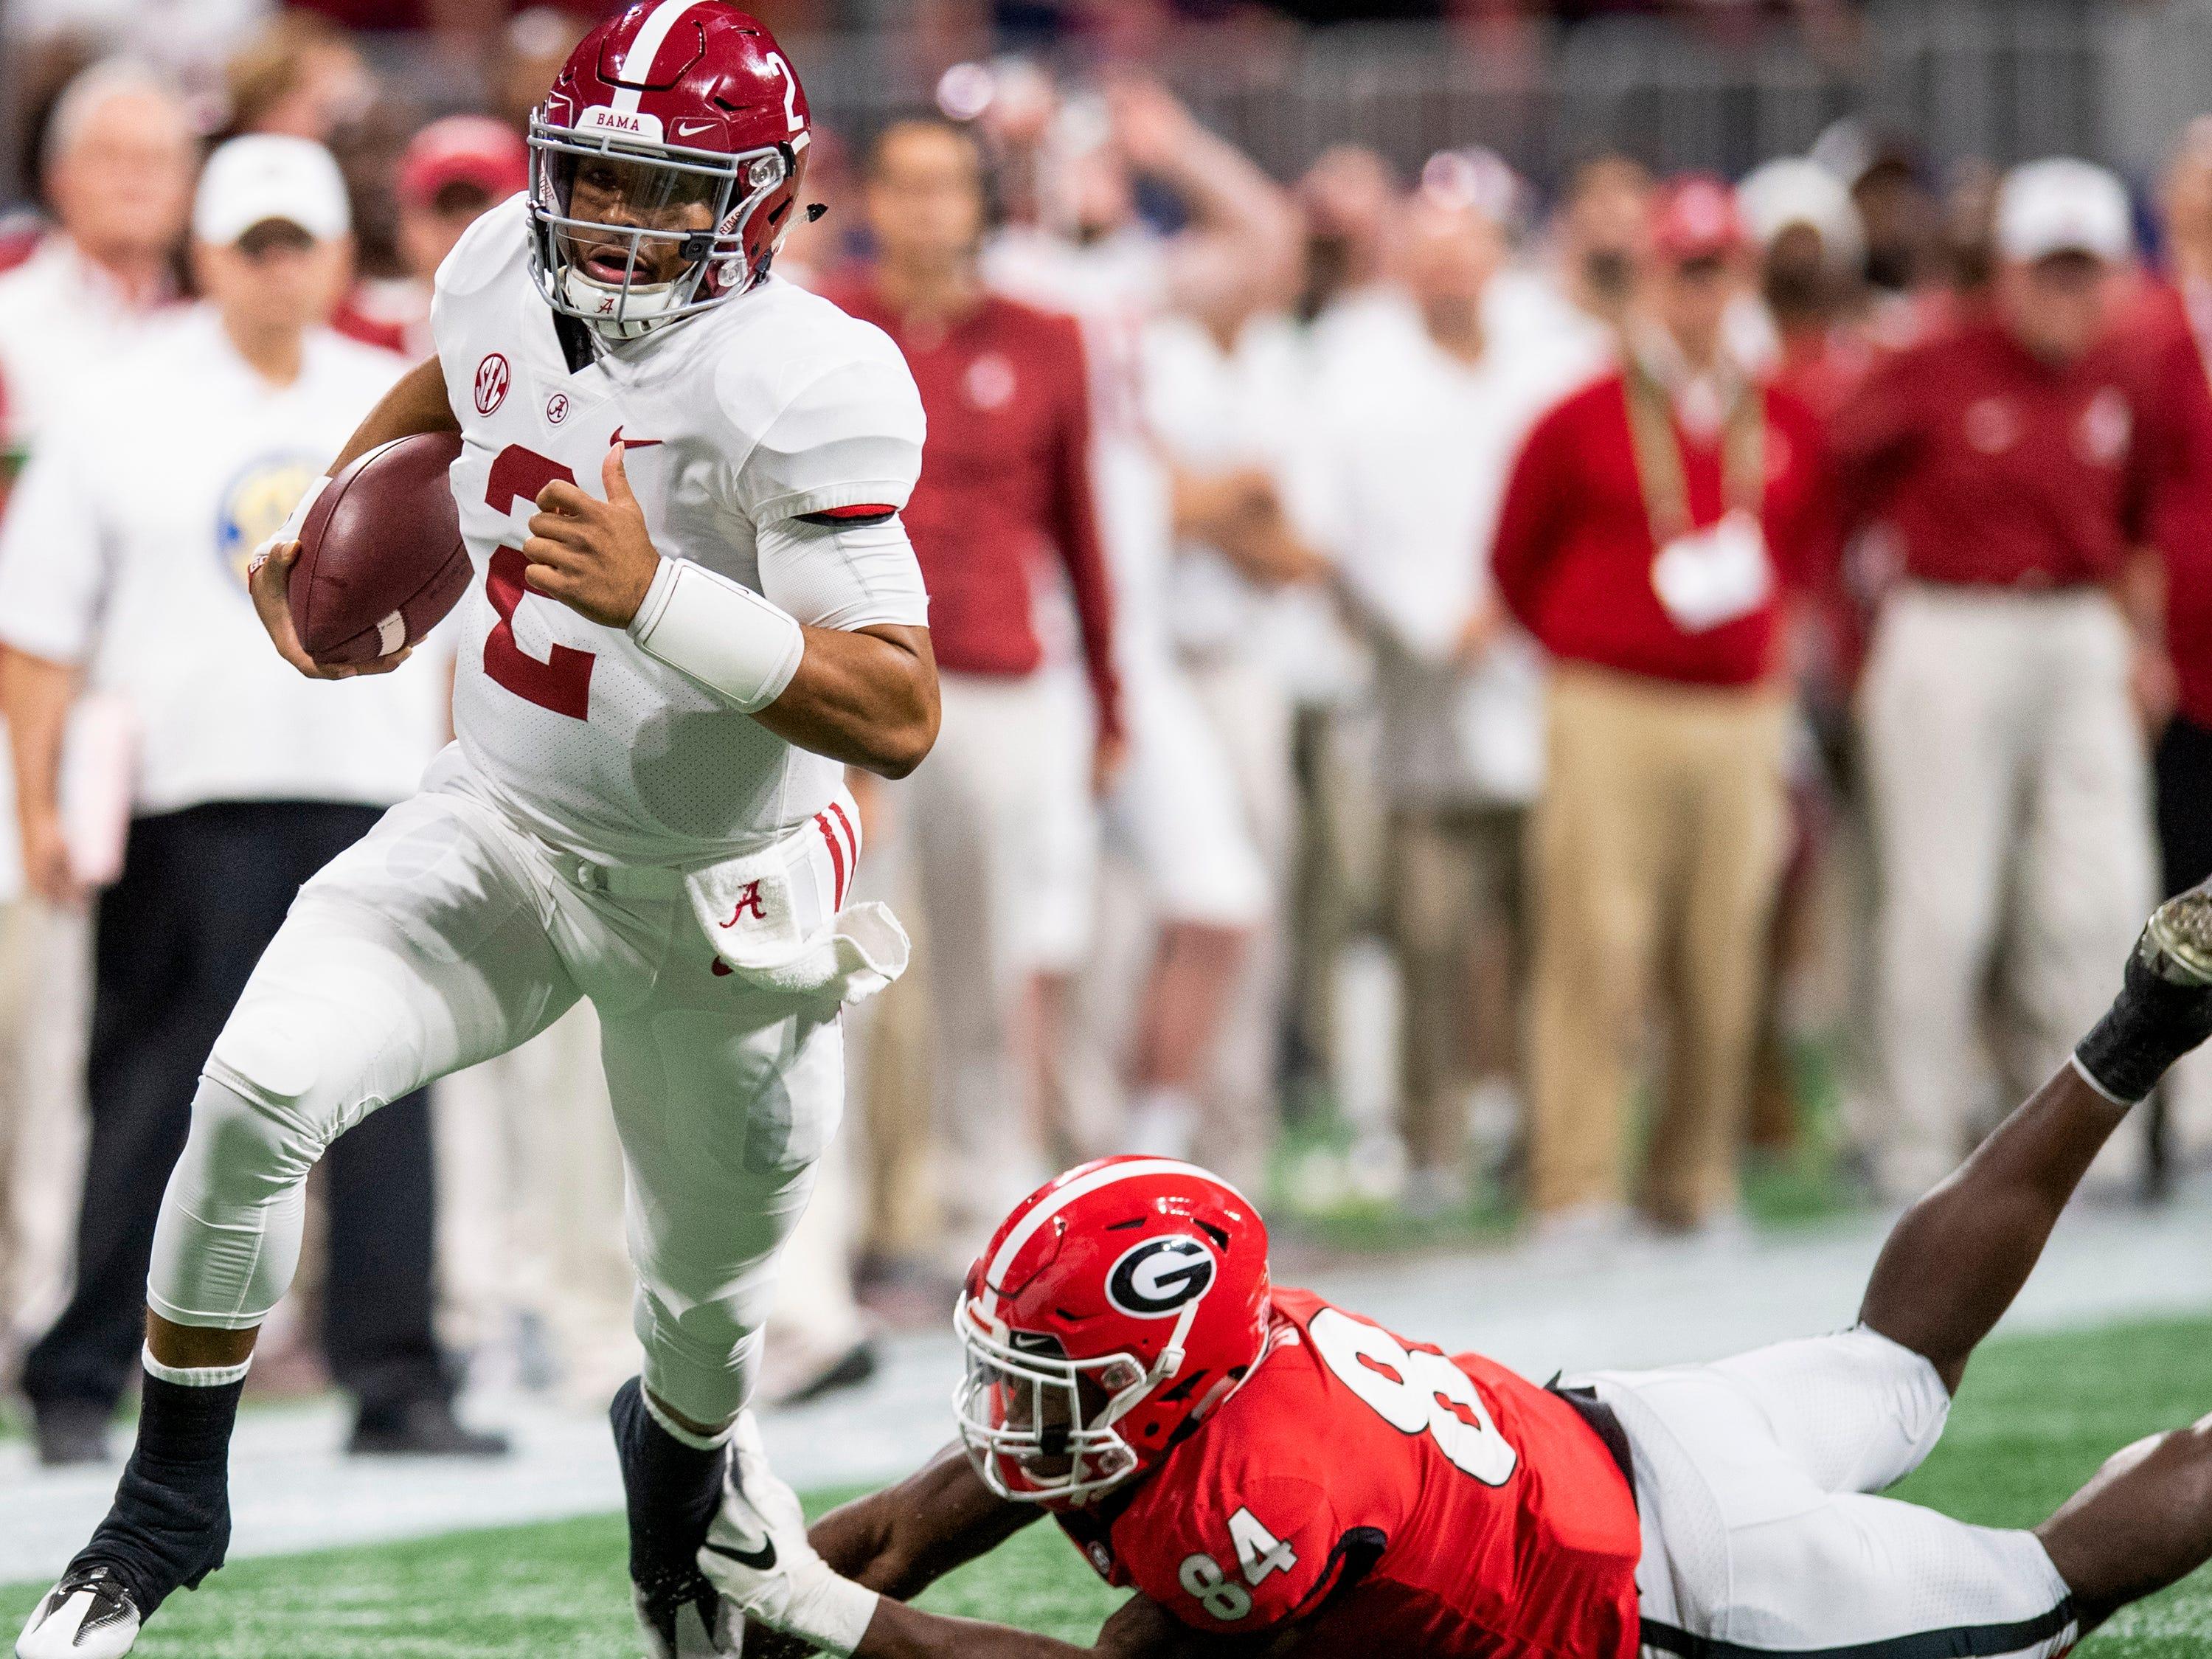 Alabama quarterback Jalen Hurts (2) carries the ball against Georgia in the SEC Championship Game at Mercedes Benz Stadium in Atlanta, Ga., on Saturday December 1, 2018.